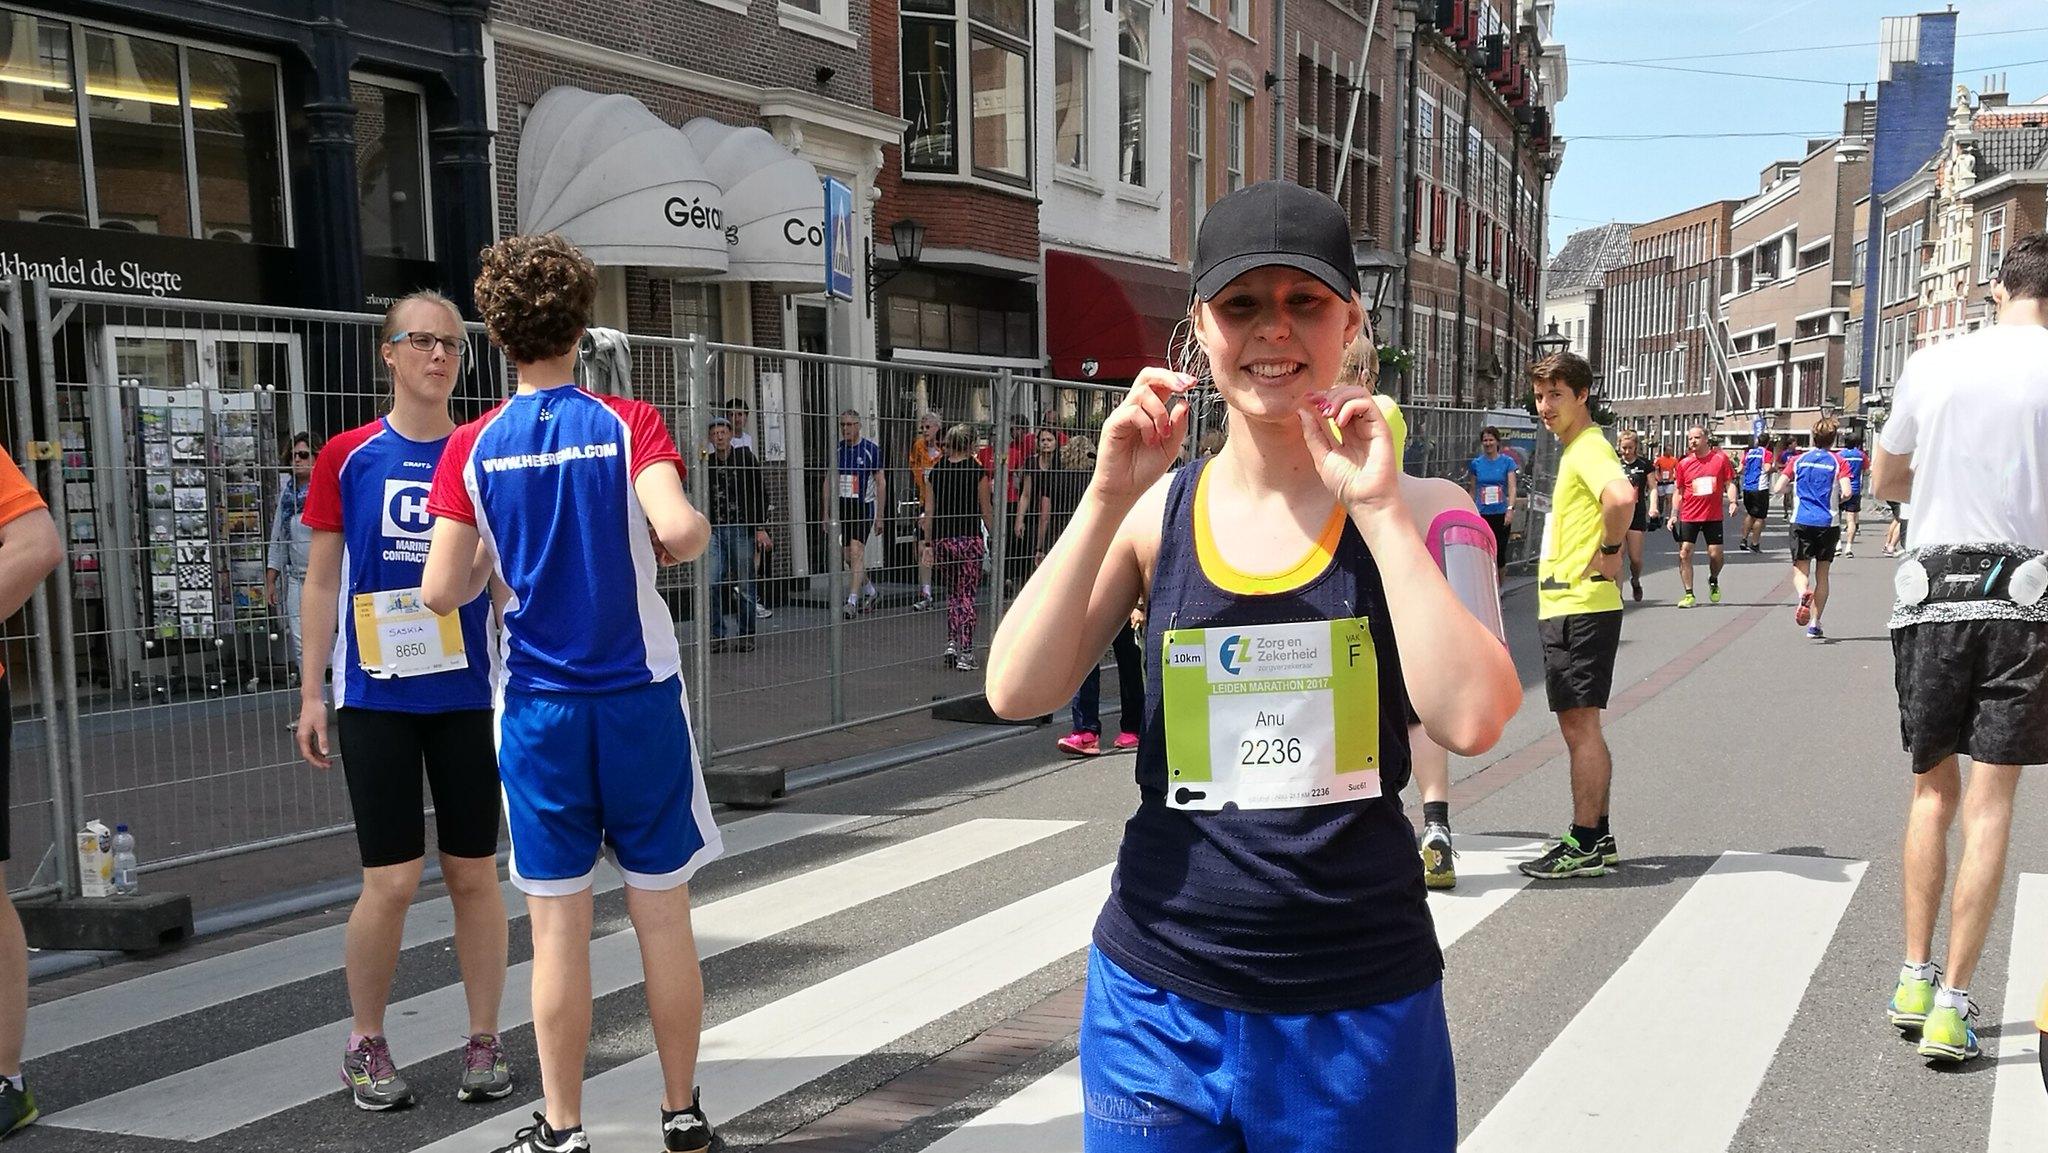 leidenin_maraton3